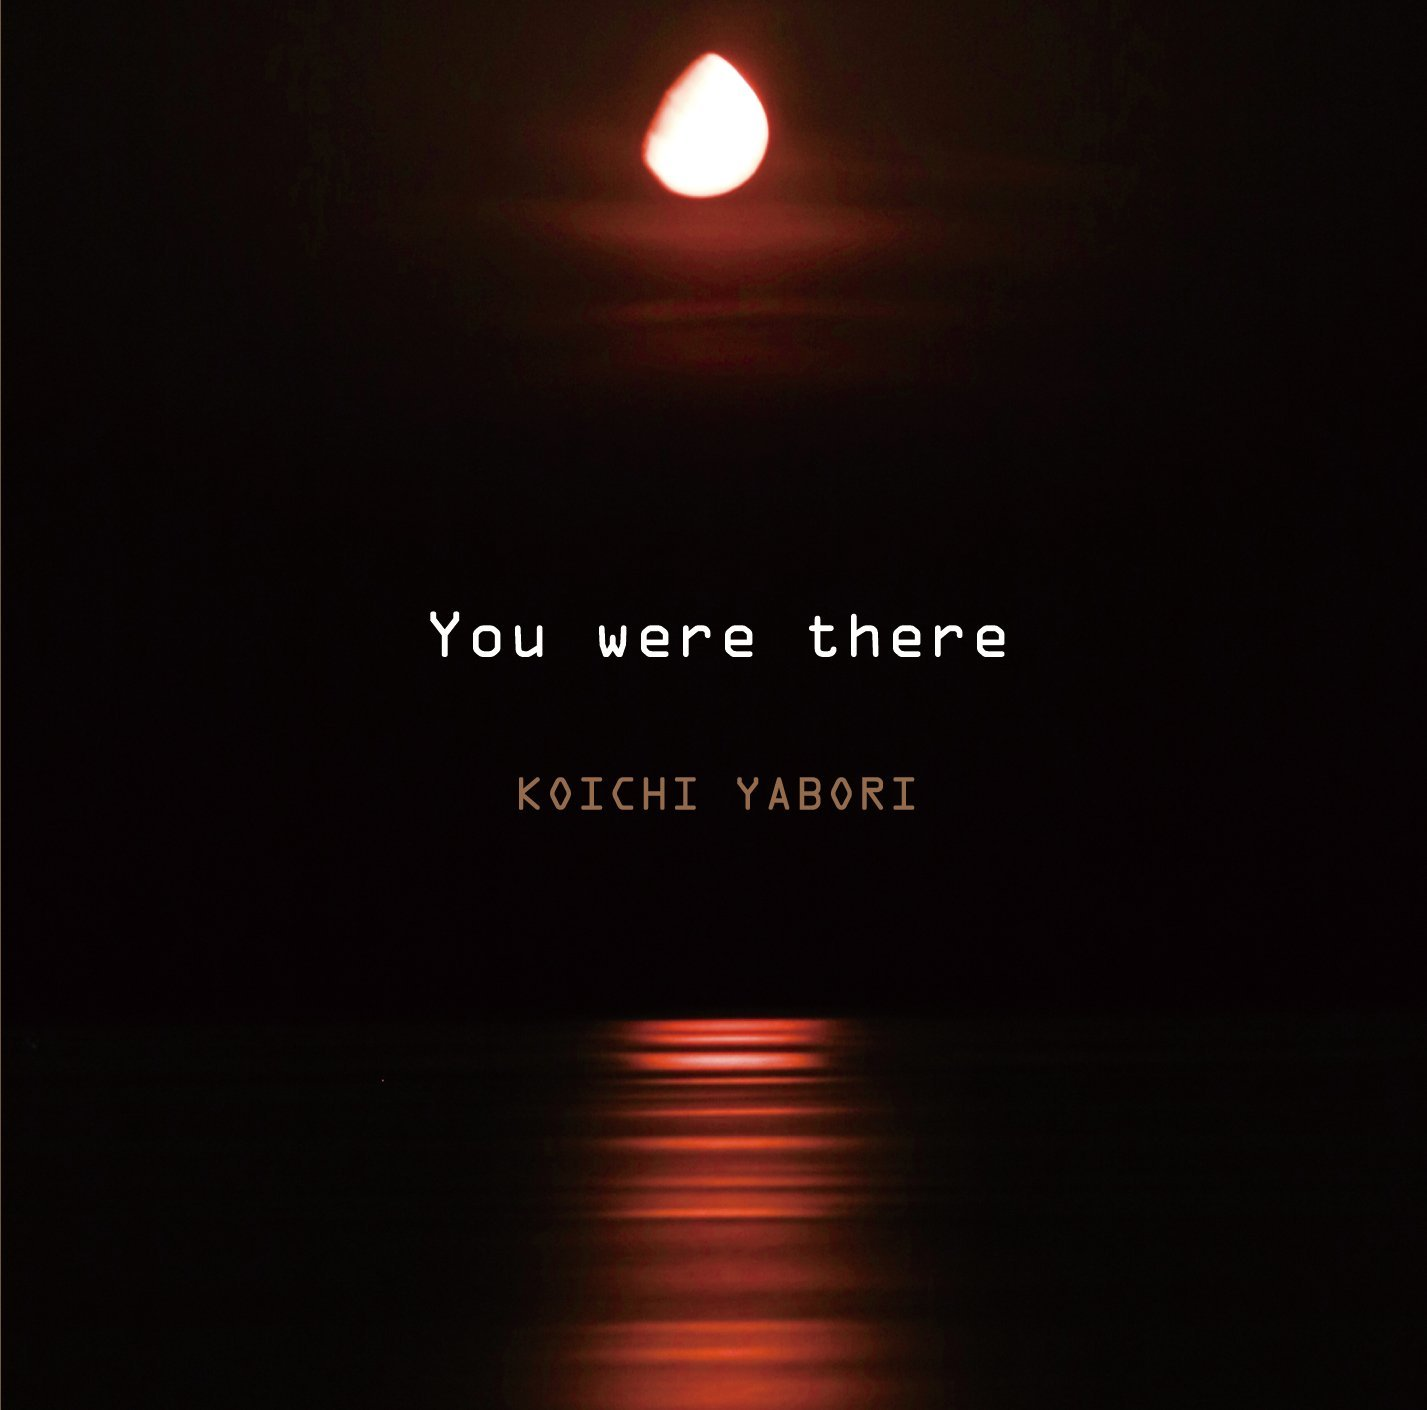 Koichi Yabori/You were there